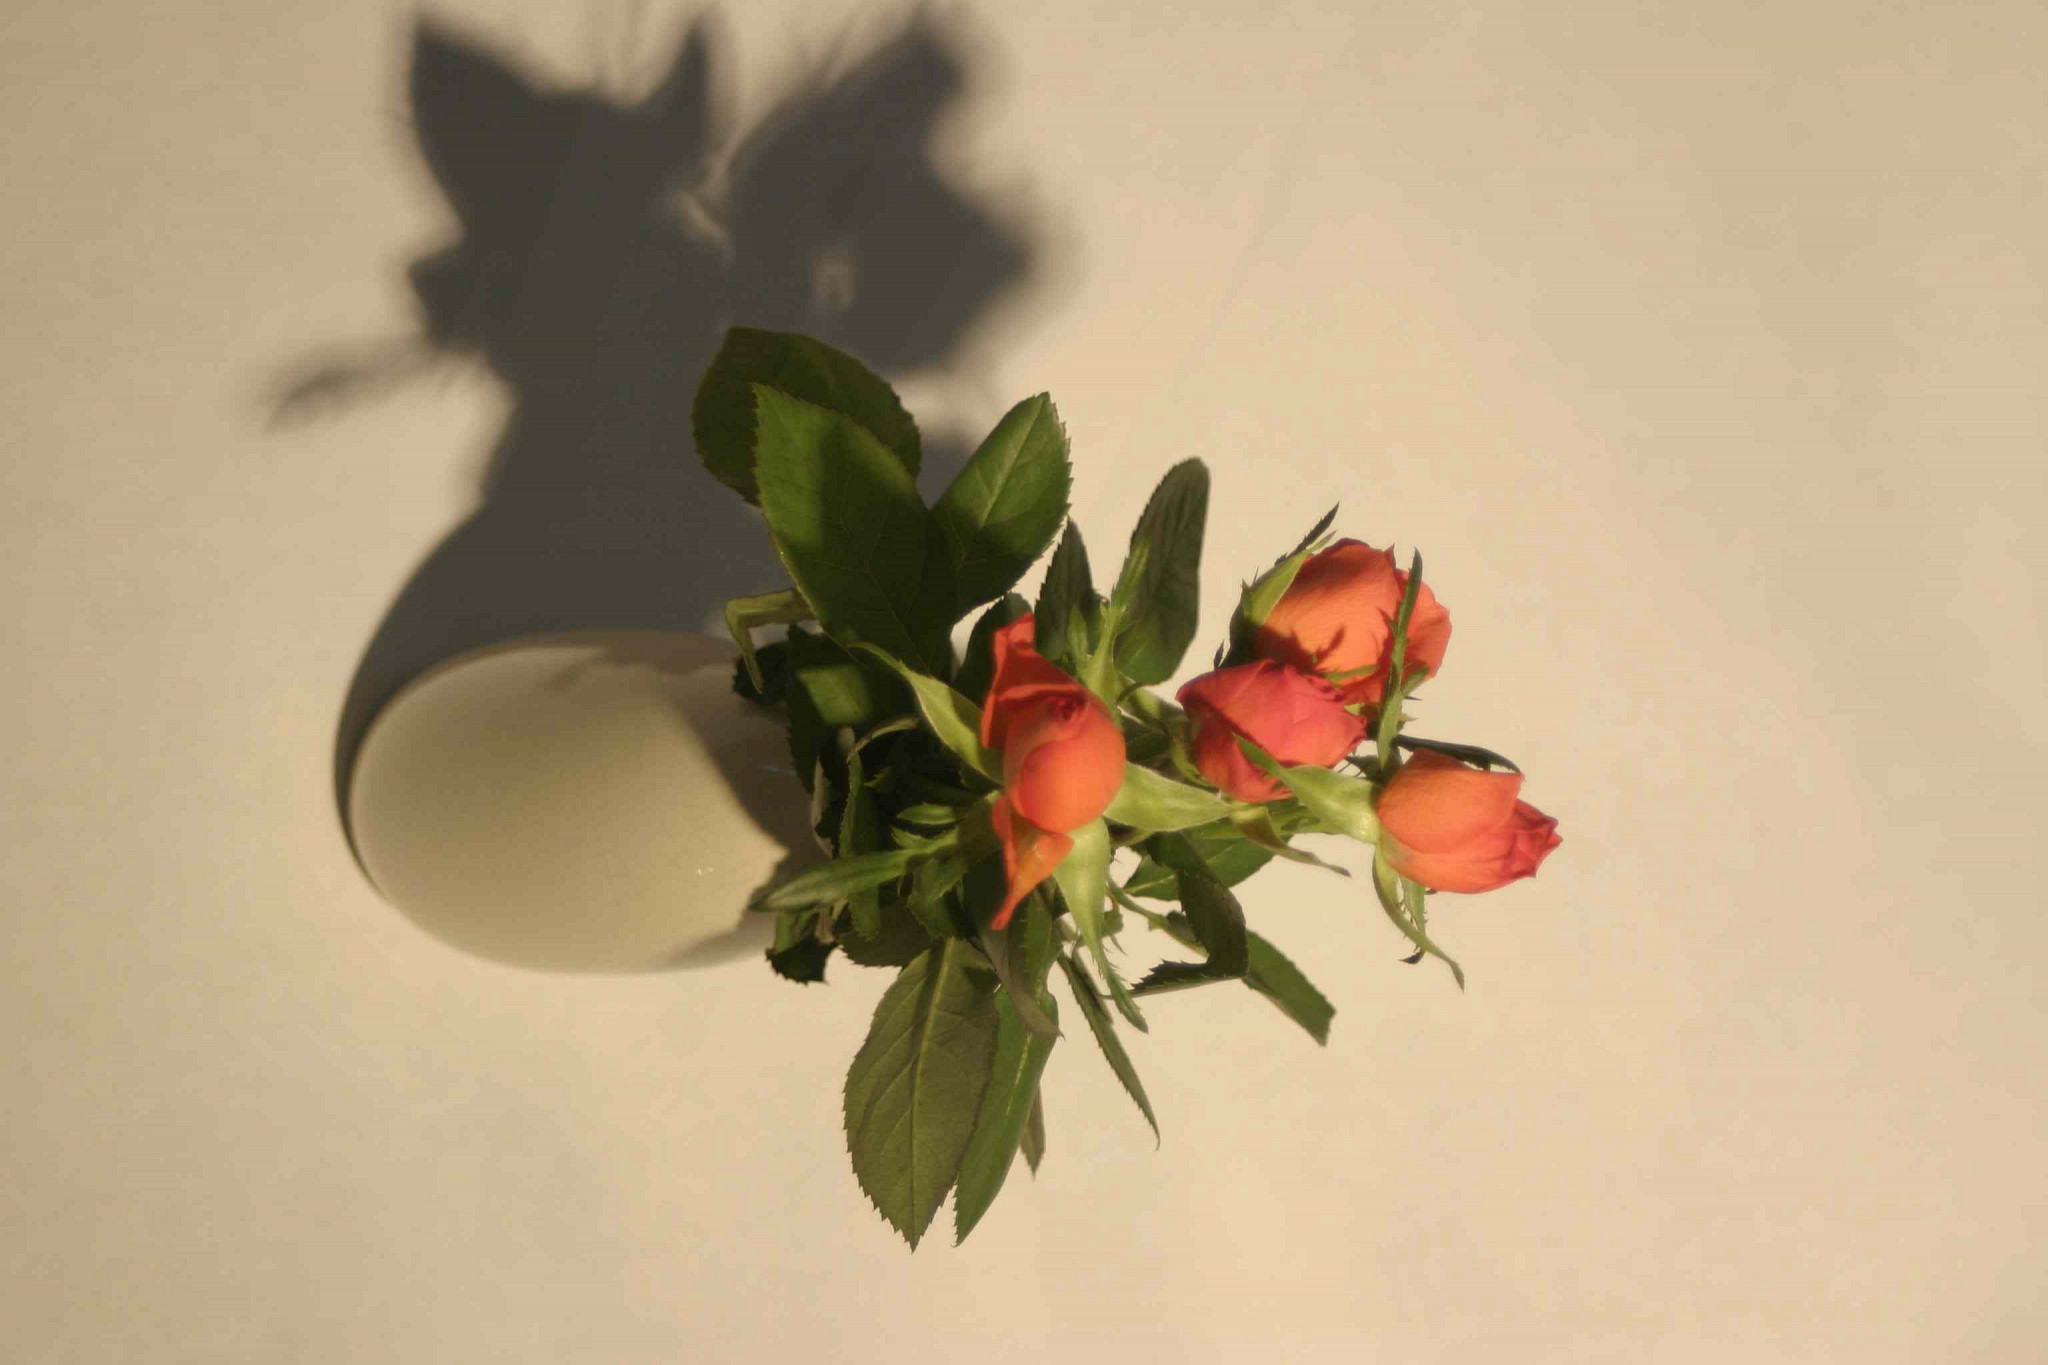 Photographing flowers original